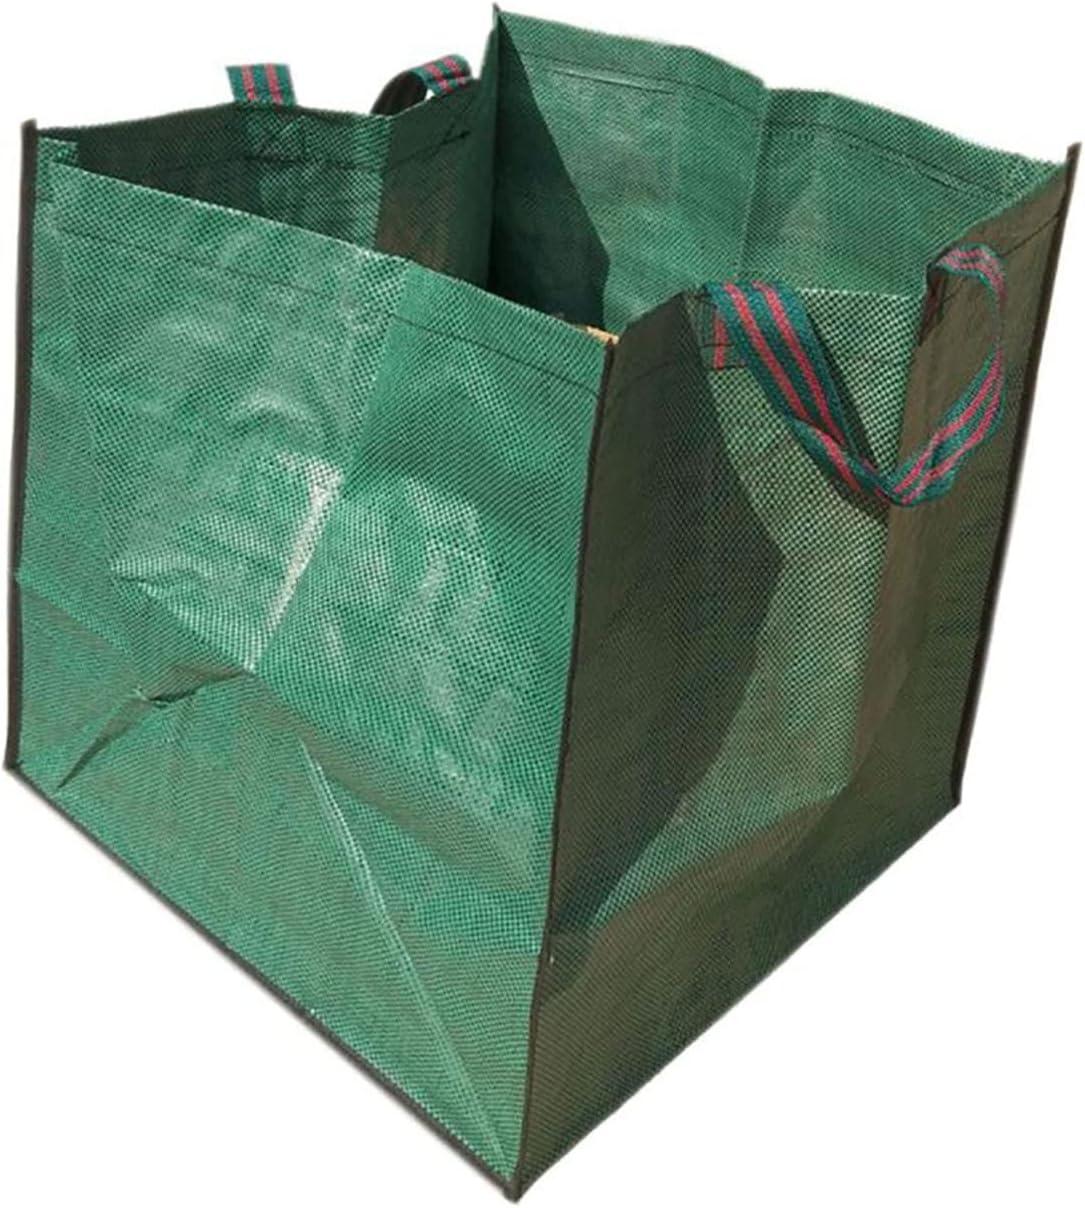 Yajun Purchase Home Yard Waste Bags Heavy PP 505050cm Tear-Resistant Duty sale